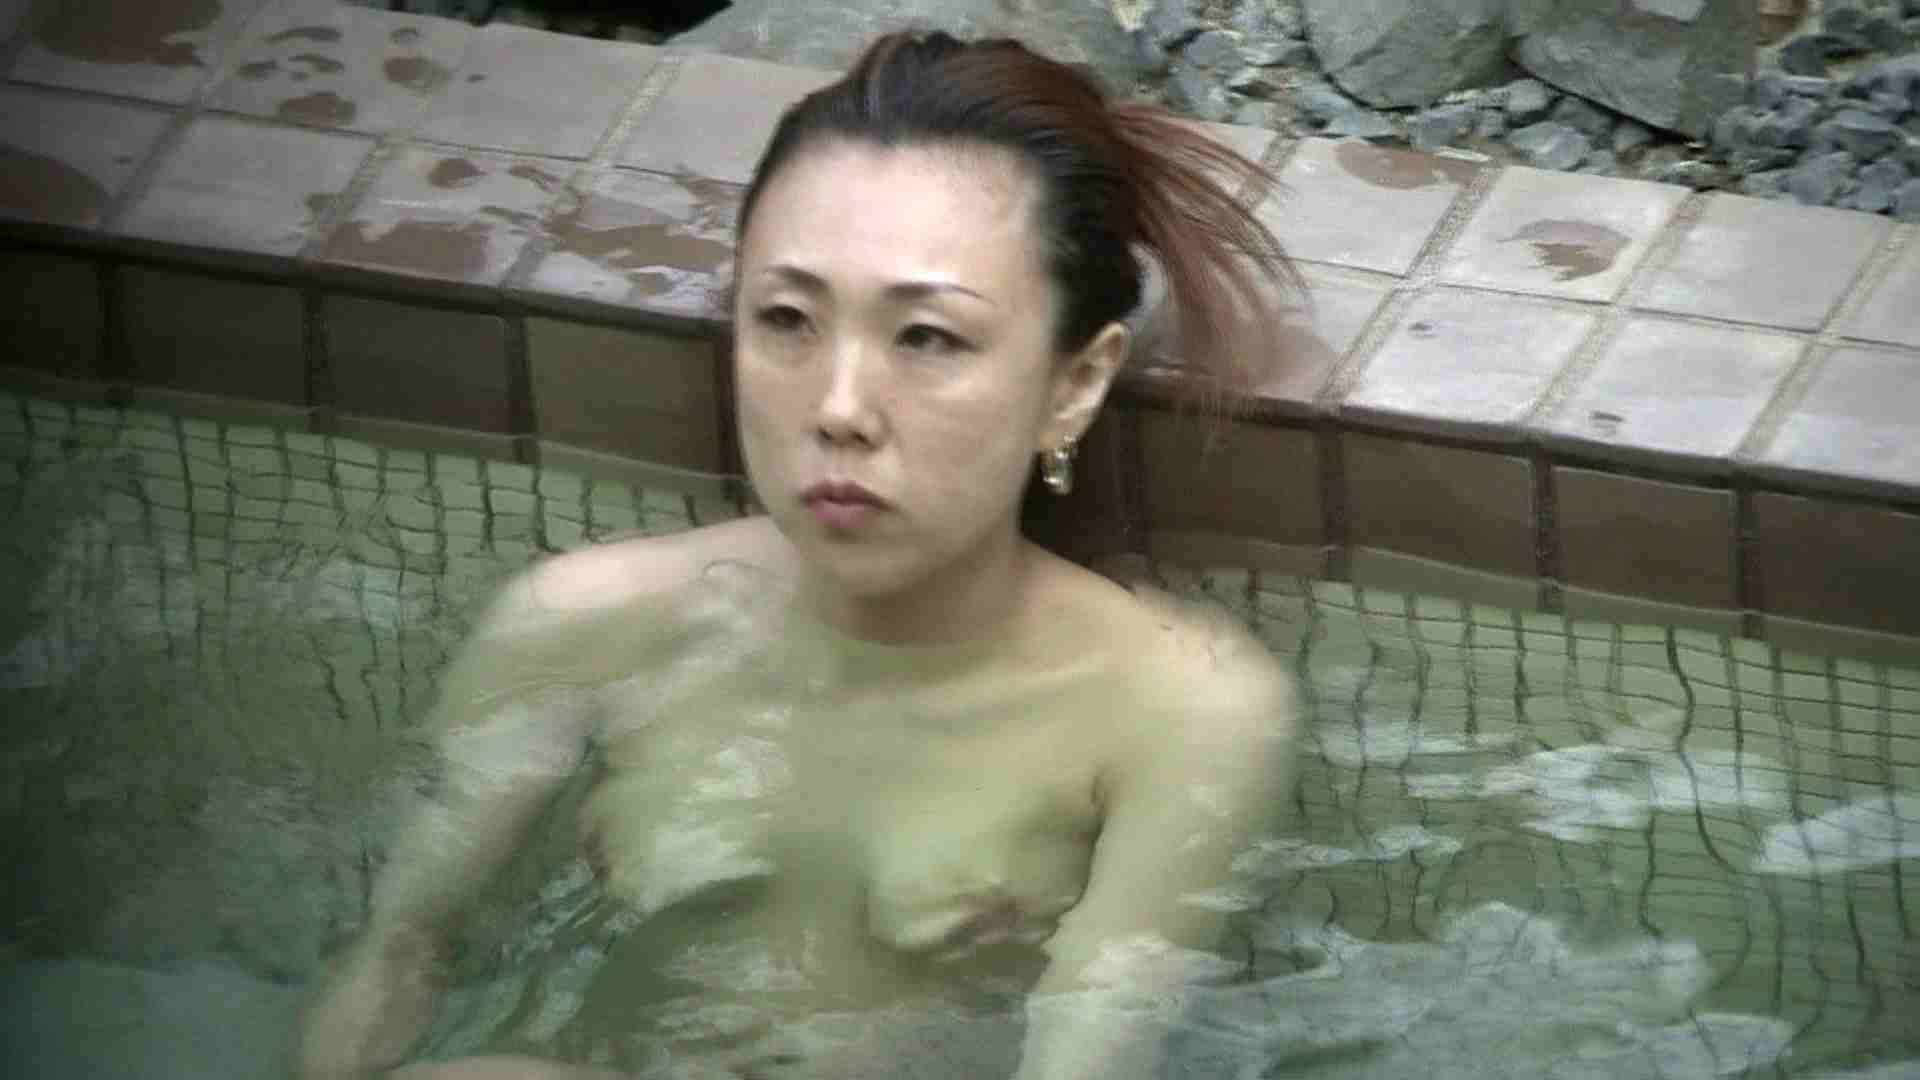 Aquaな露天風呂Vol.654 HなOL | 盗撮  60pic 32